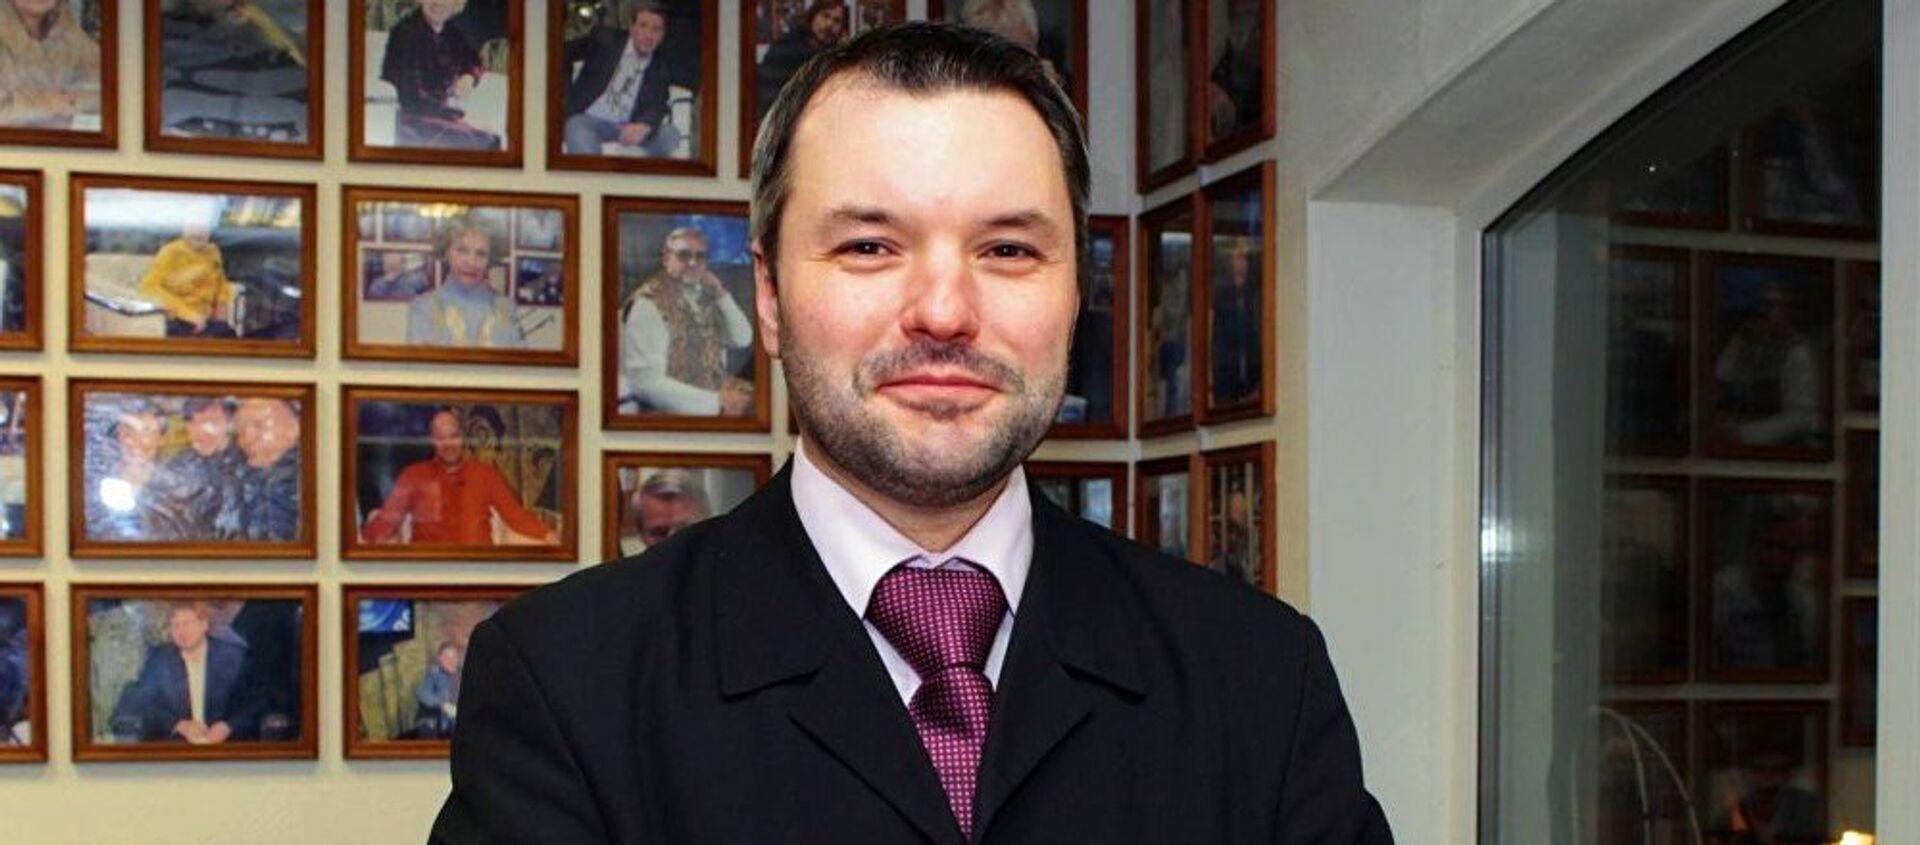 Эксперт Дмитрий Солонников - Sputnik Азербайджан, 1920, 02.04.2021